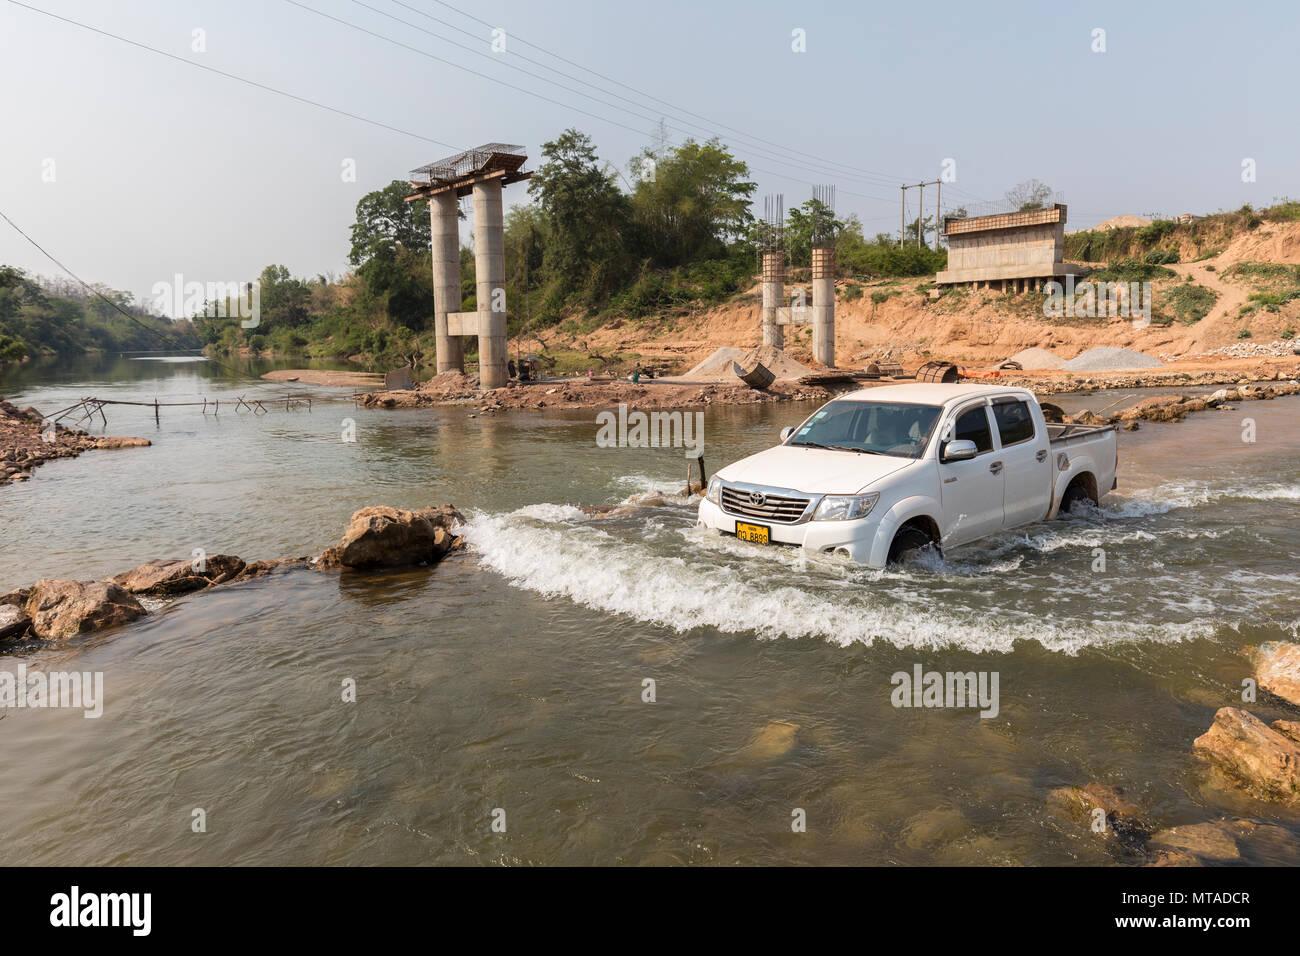 Crossing the Xe Bangfai River, Laos - Stock Image